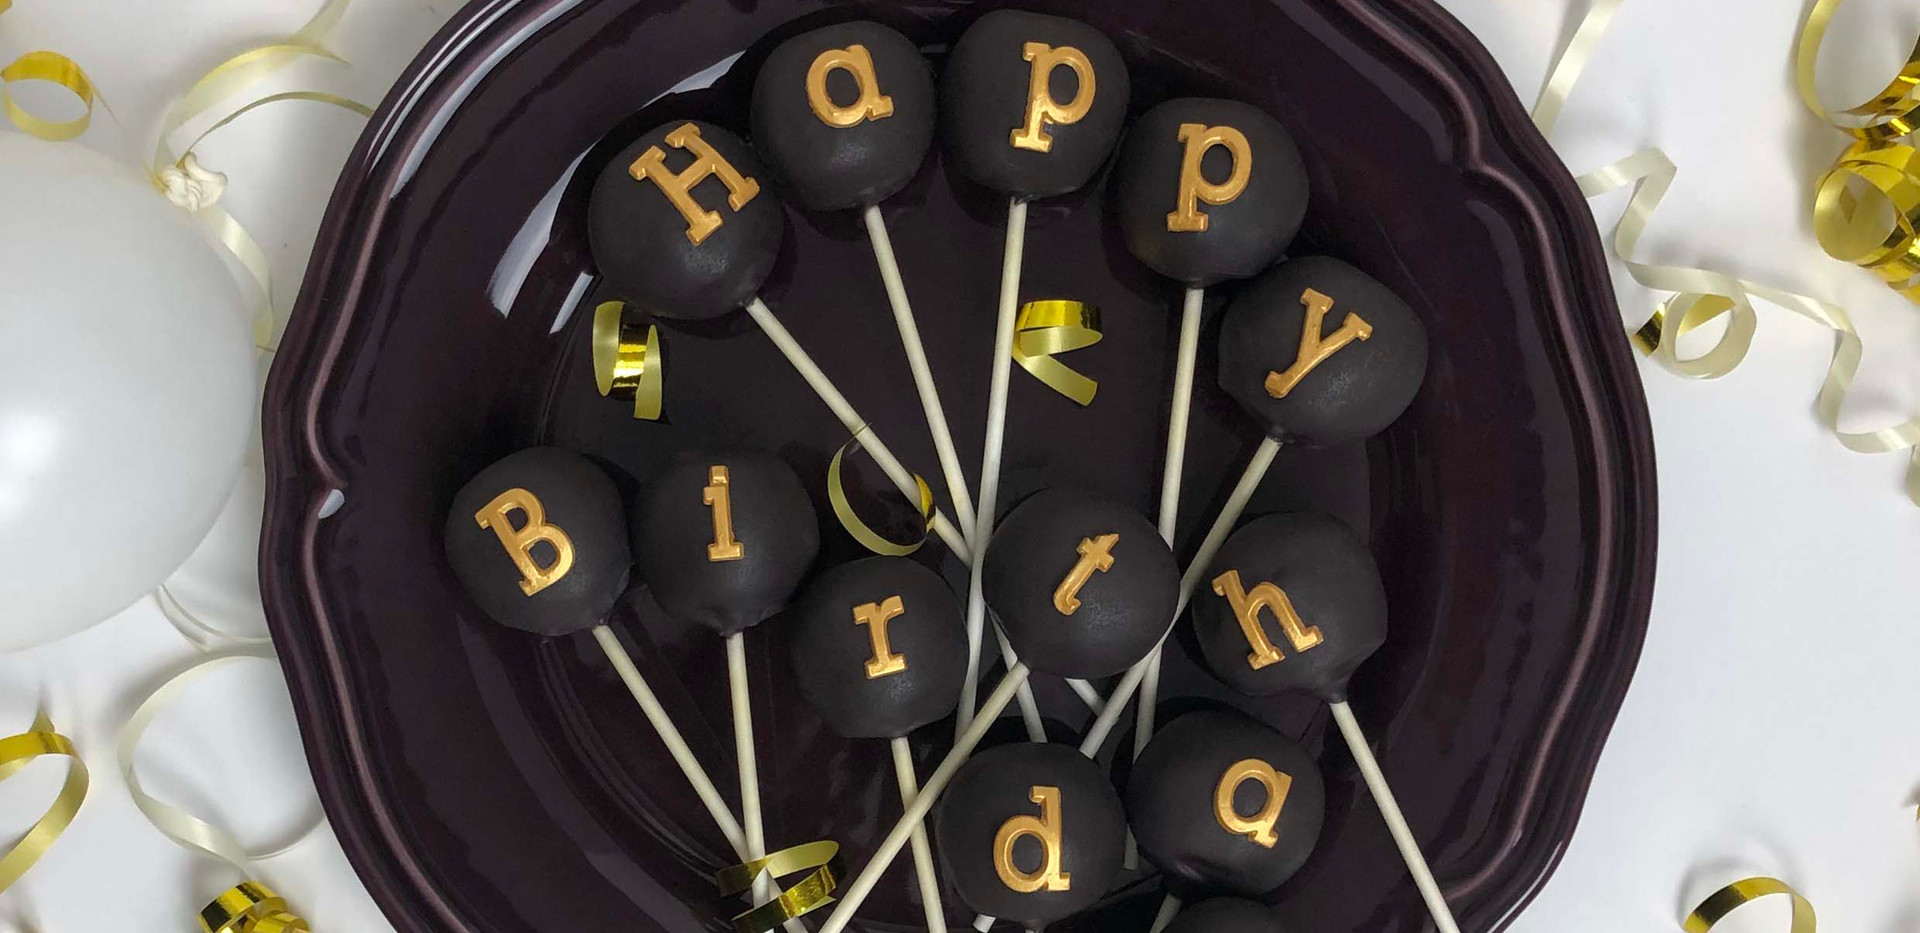 Happy Birthday Pops Full Plate Image 1 w